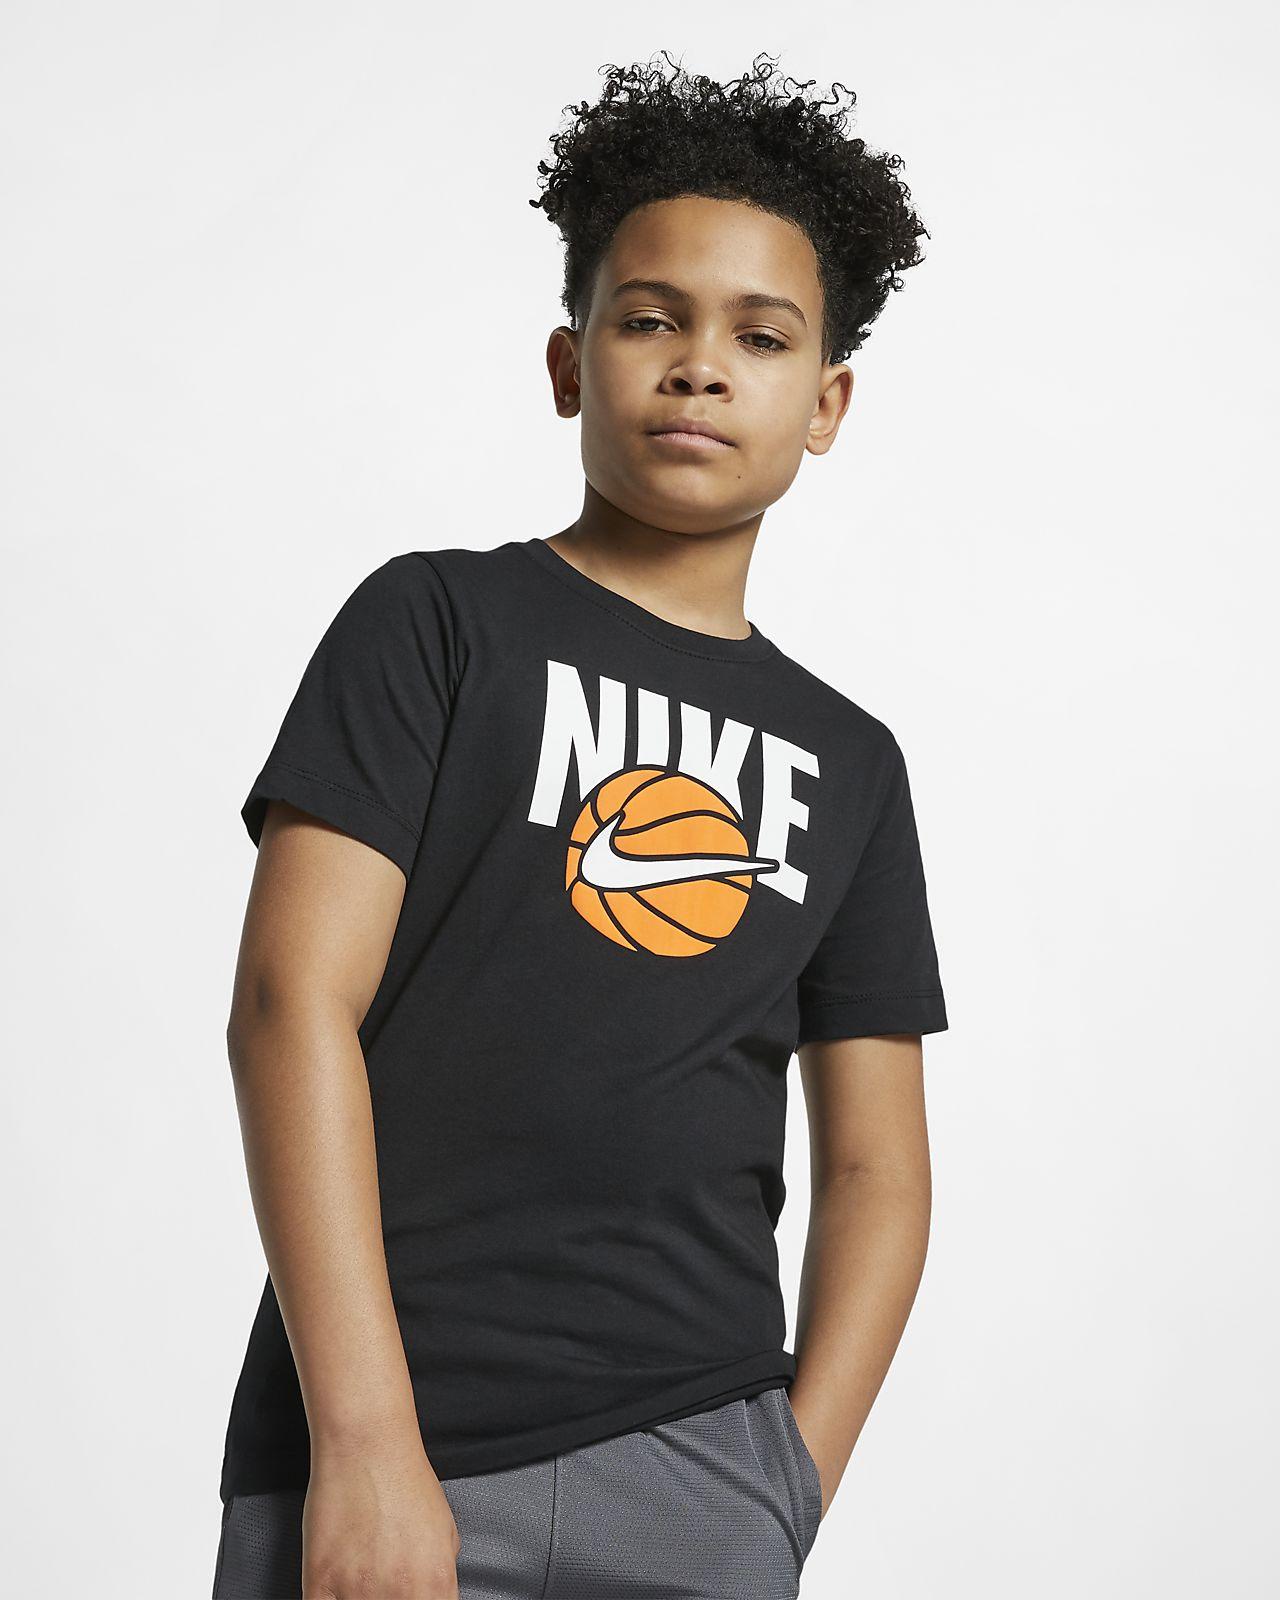 e25258d7 Nike Sportswear Older Kids' (Boys') T-Shirt. Nike.com GB